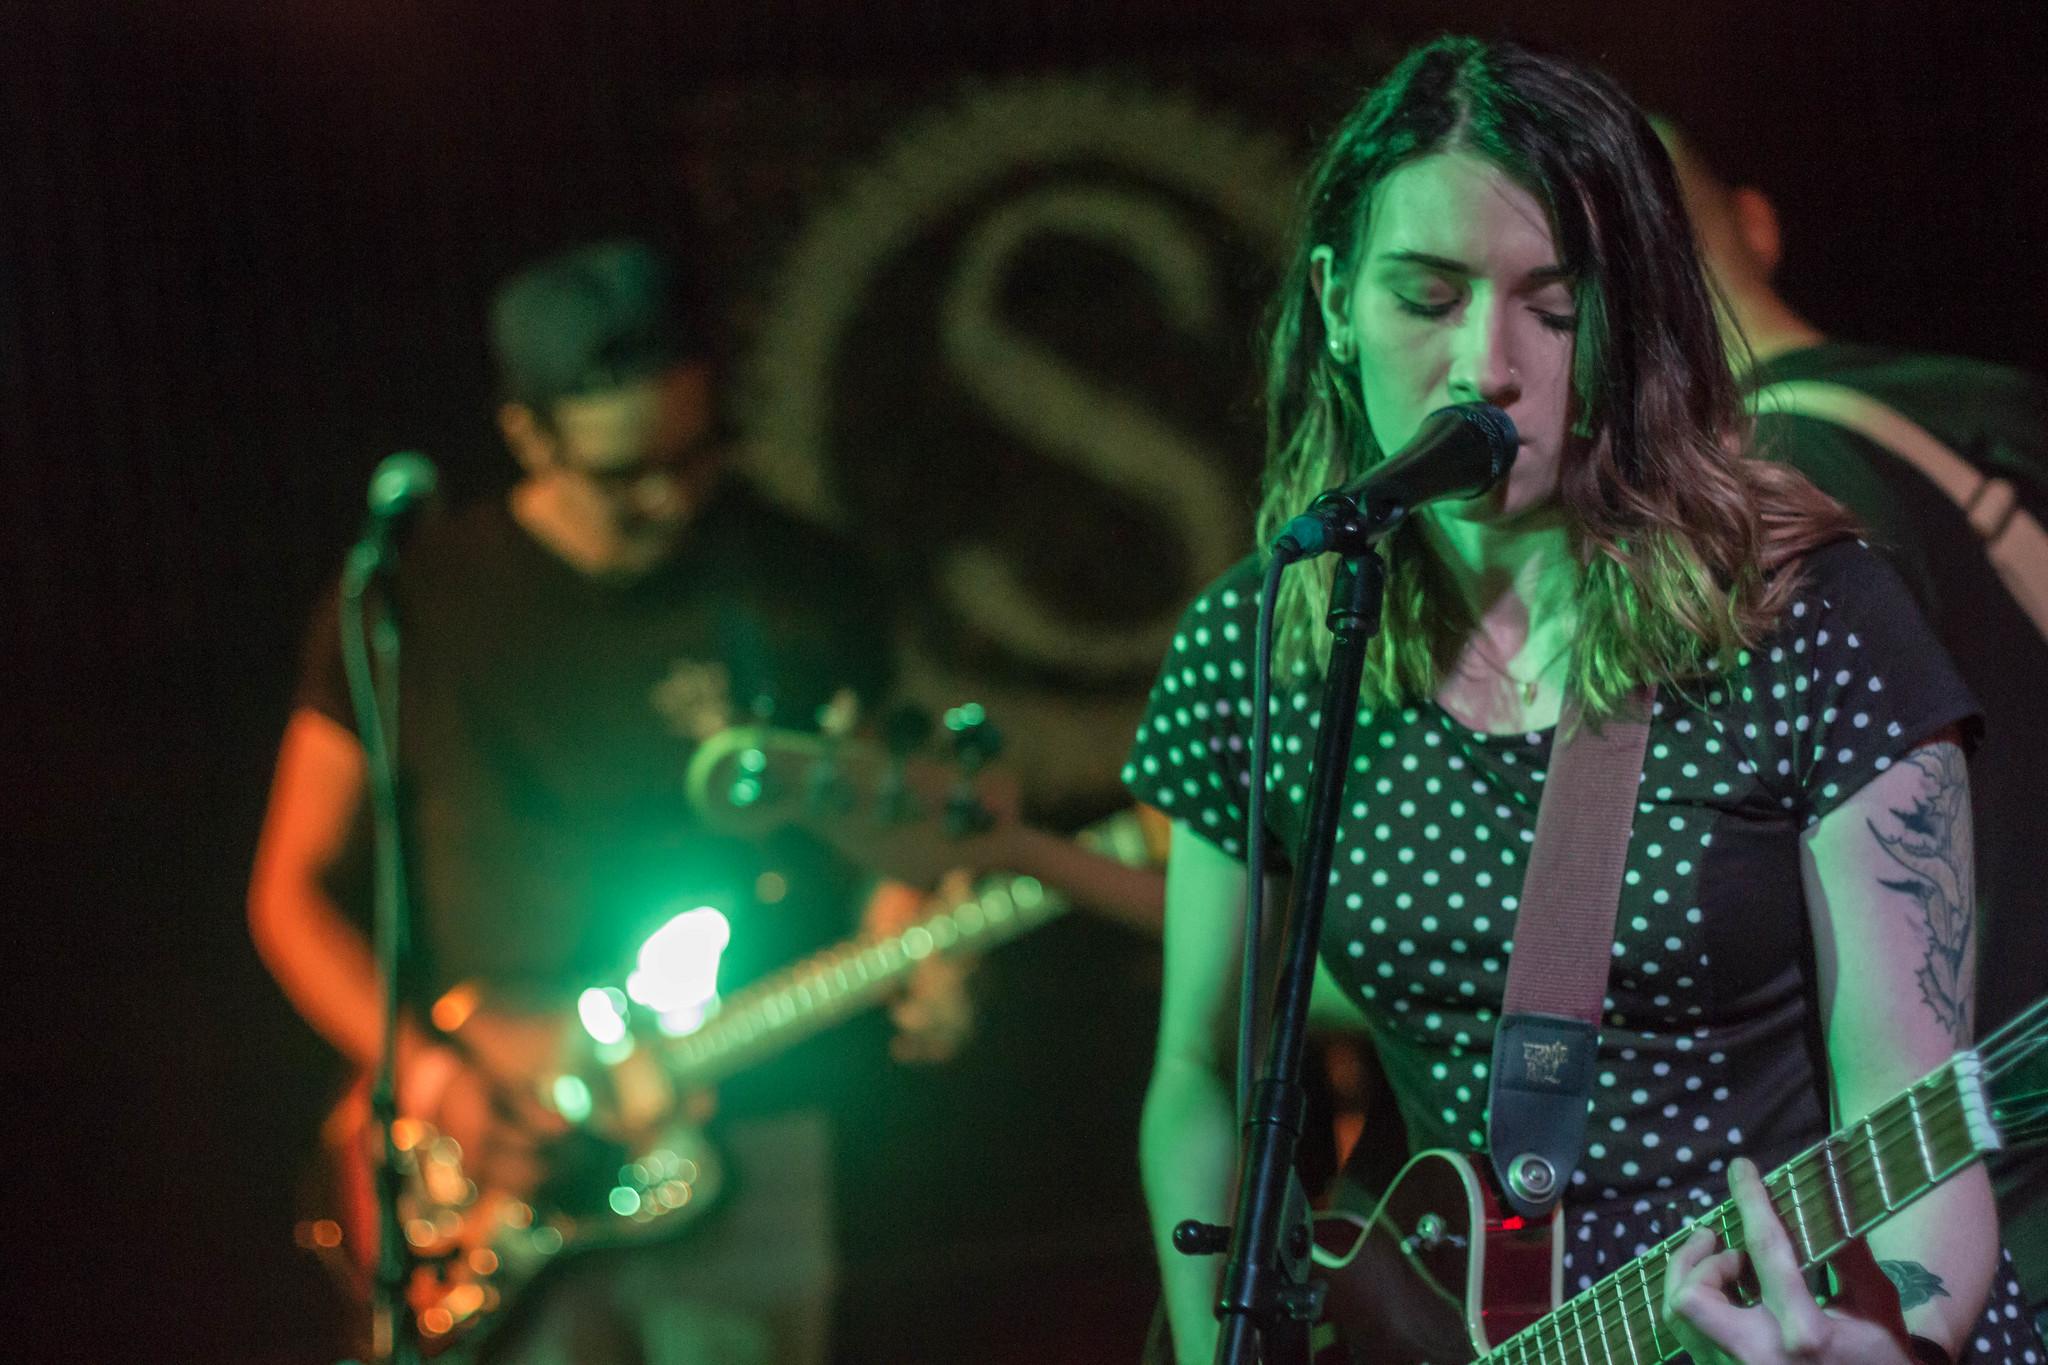 American Pinup @ The Sydney | 09/4/2015 | Benson Femme Fest